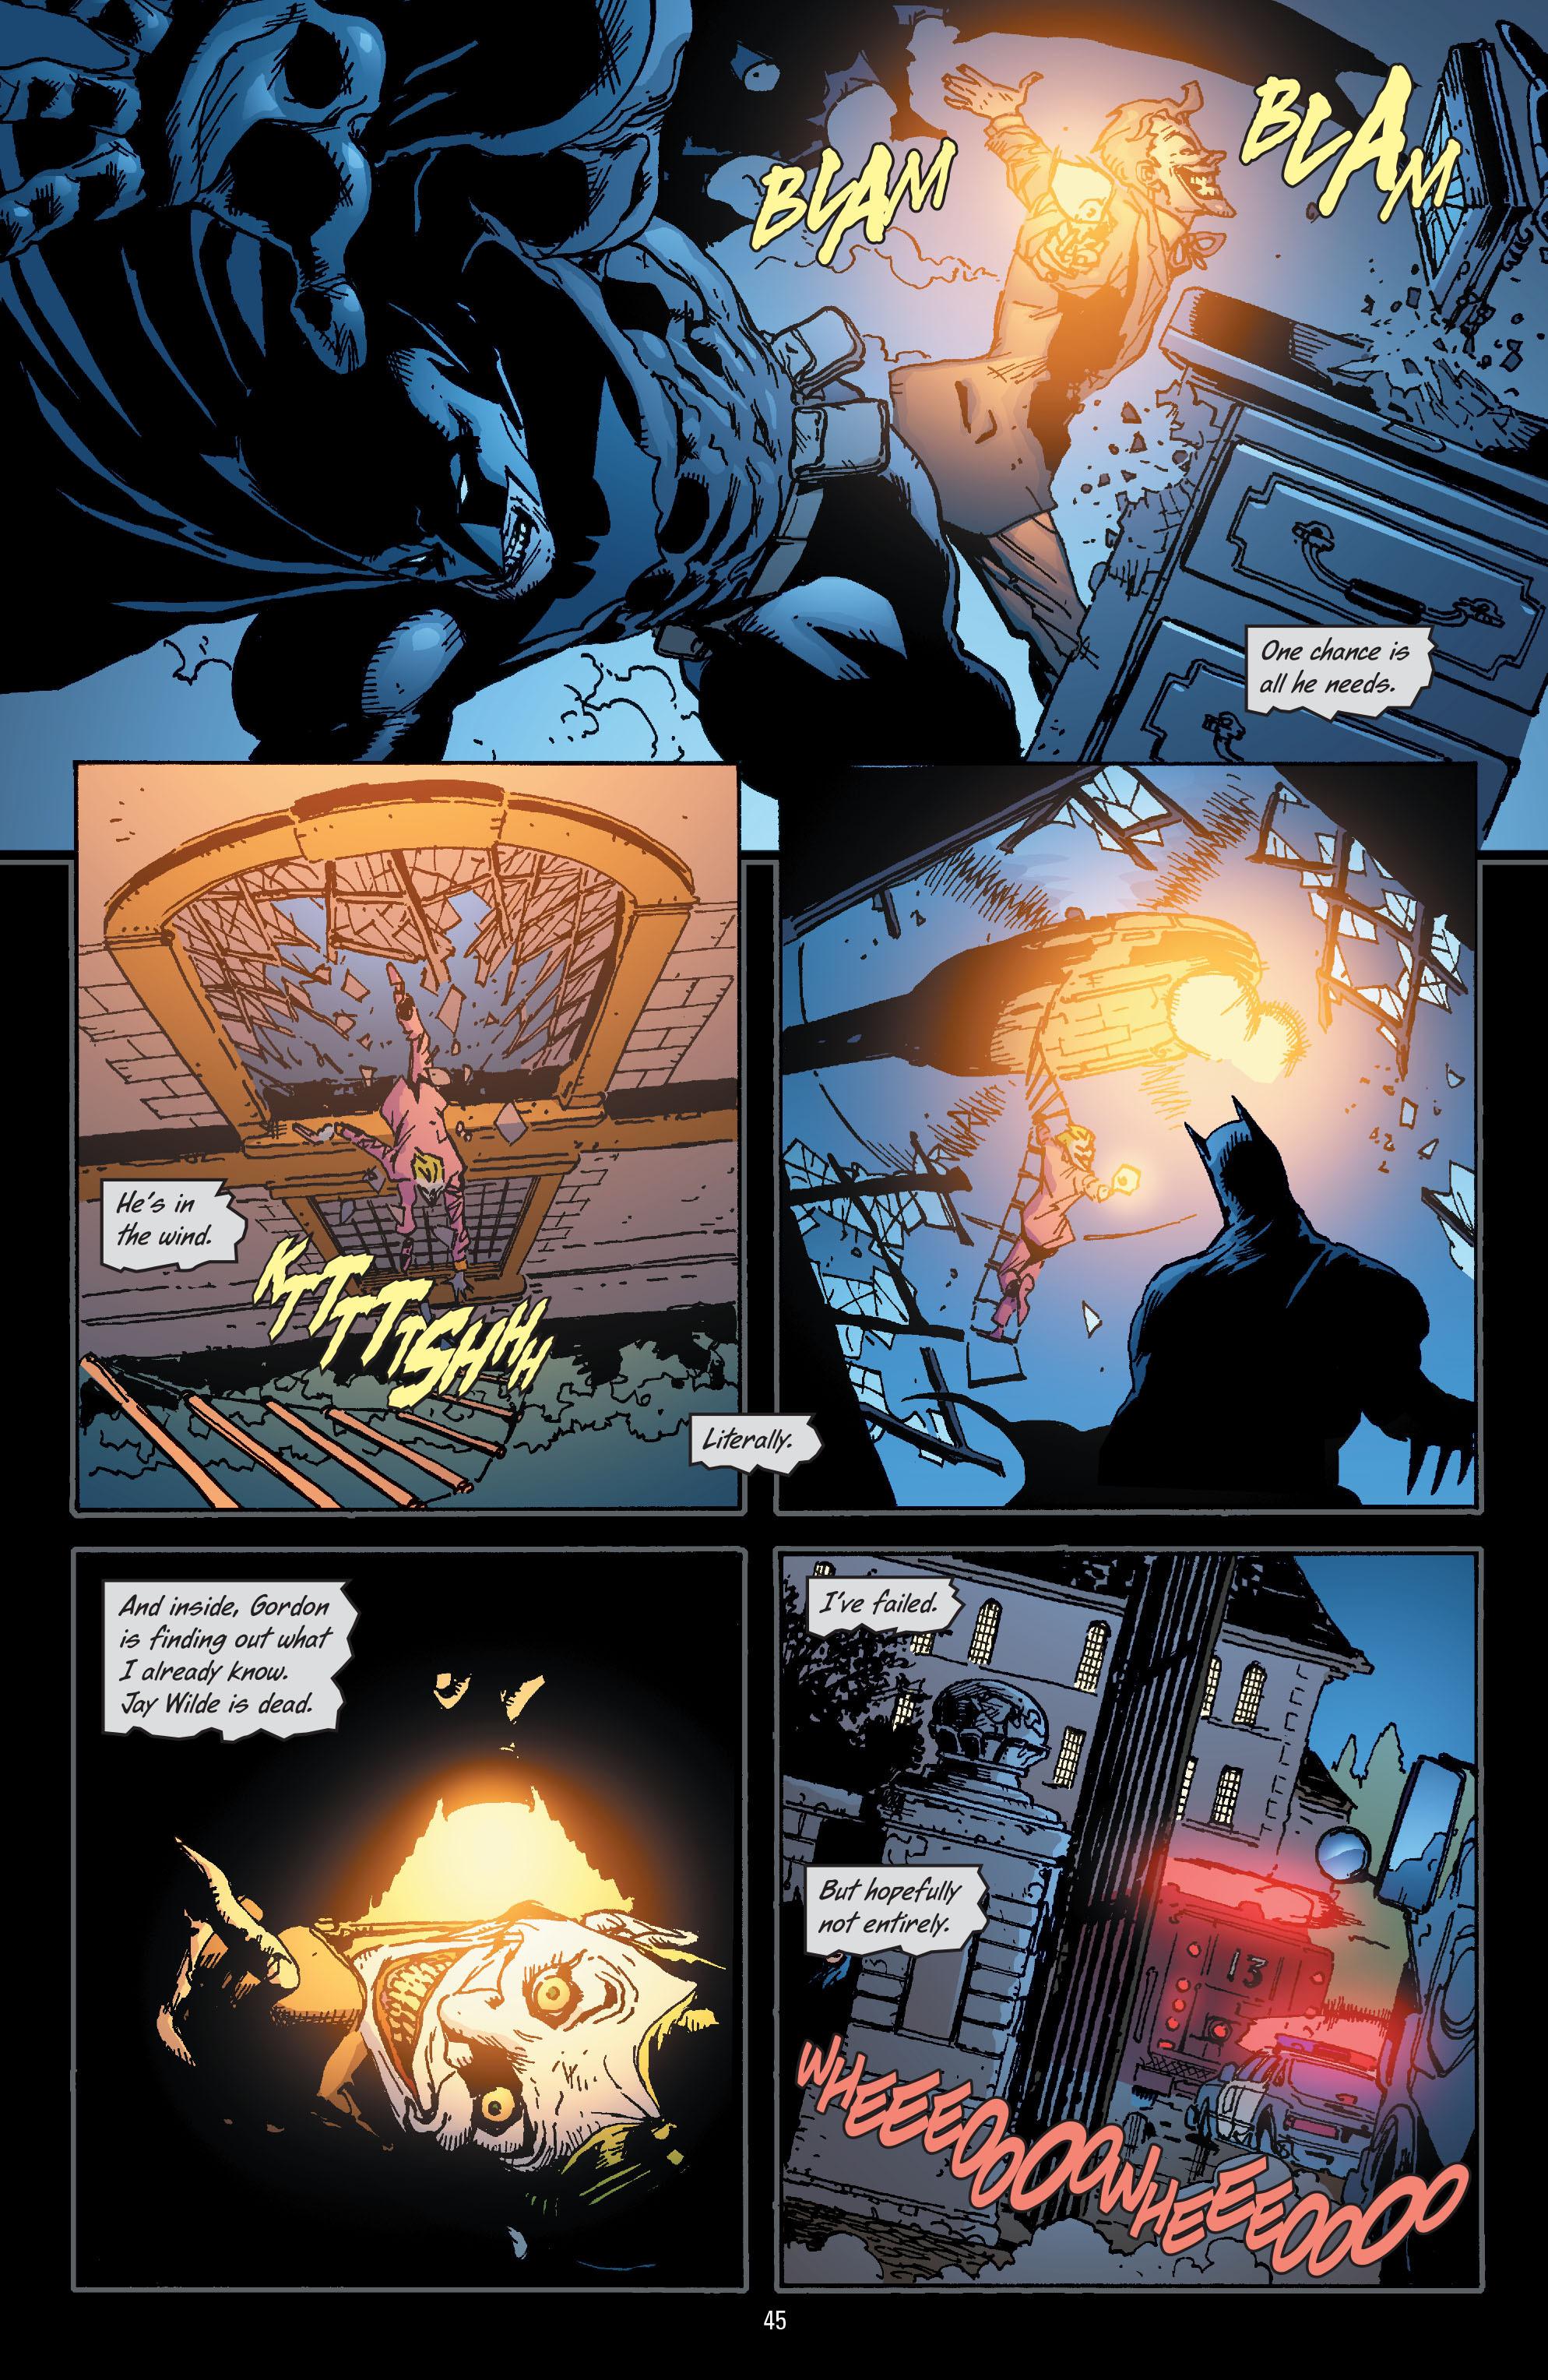 Batman: The Man Who Laughs chap 1 pic 46